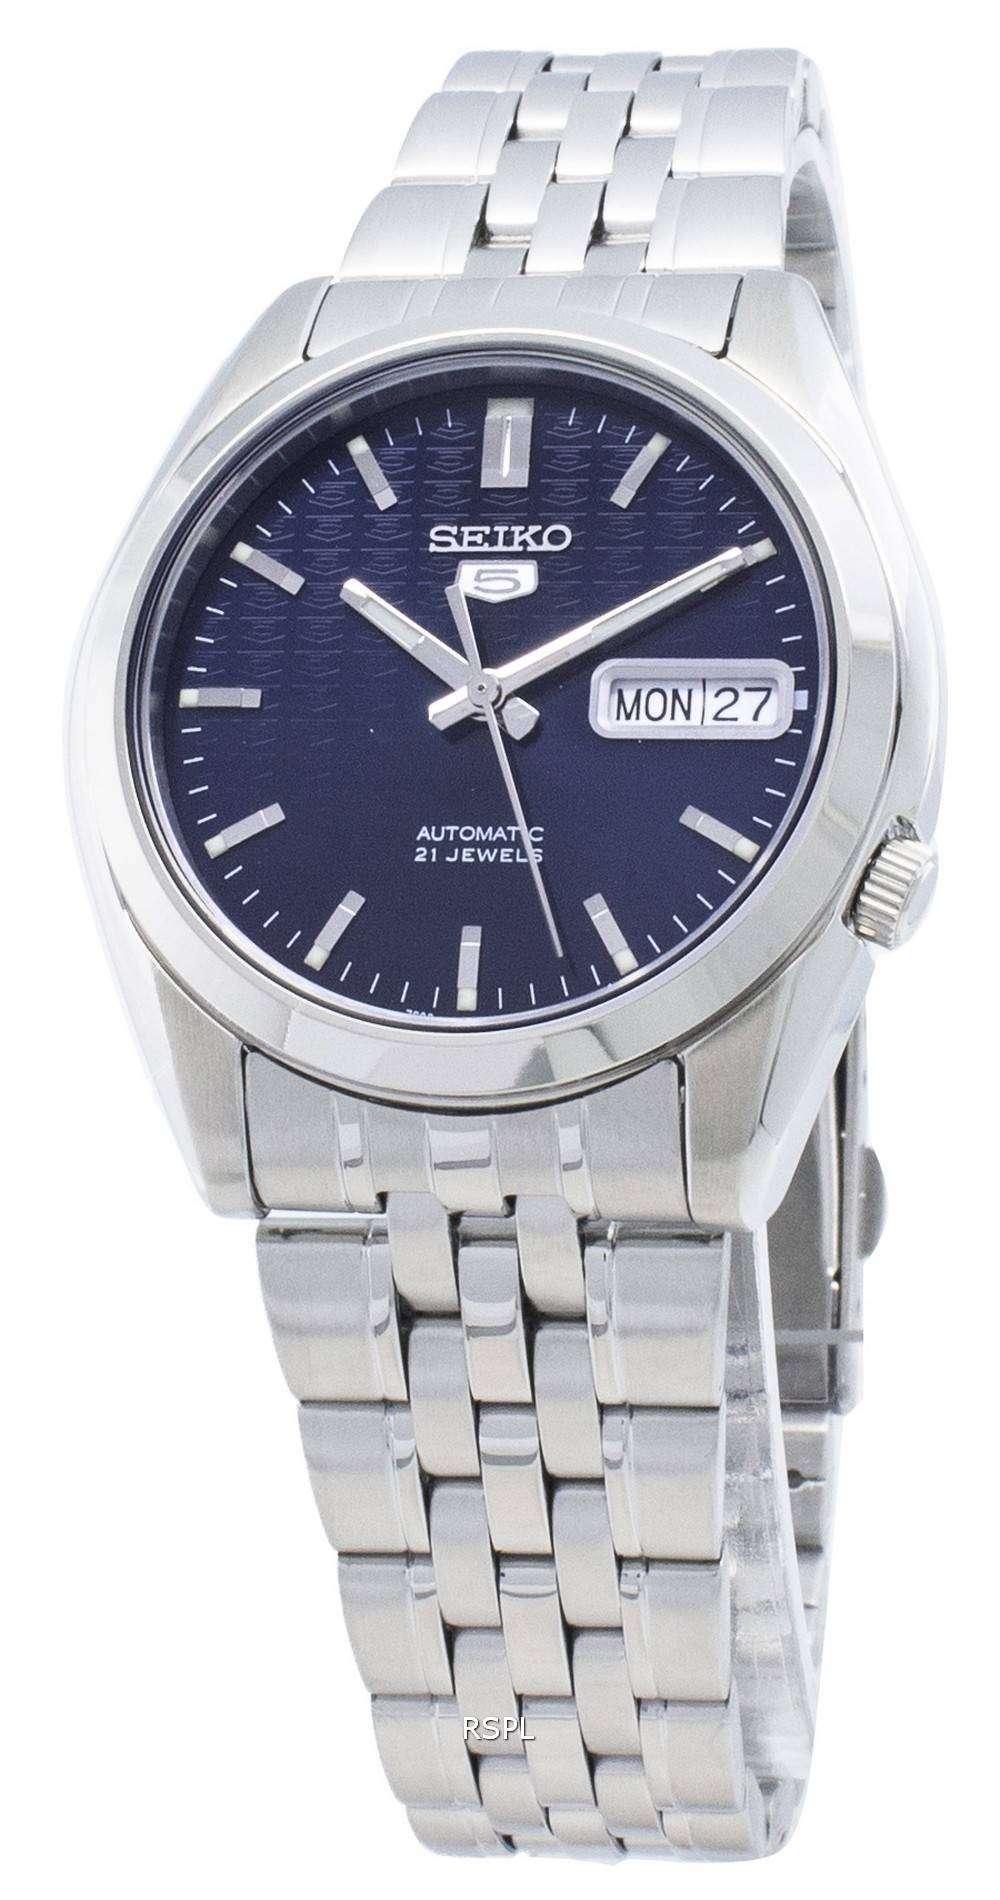 Refurbished Seiko 5 Automatic SNK357 SNK357K1 SNK357K Analog Men's Watch